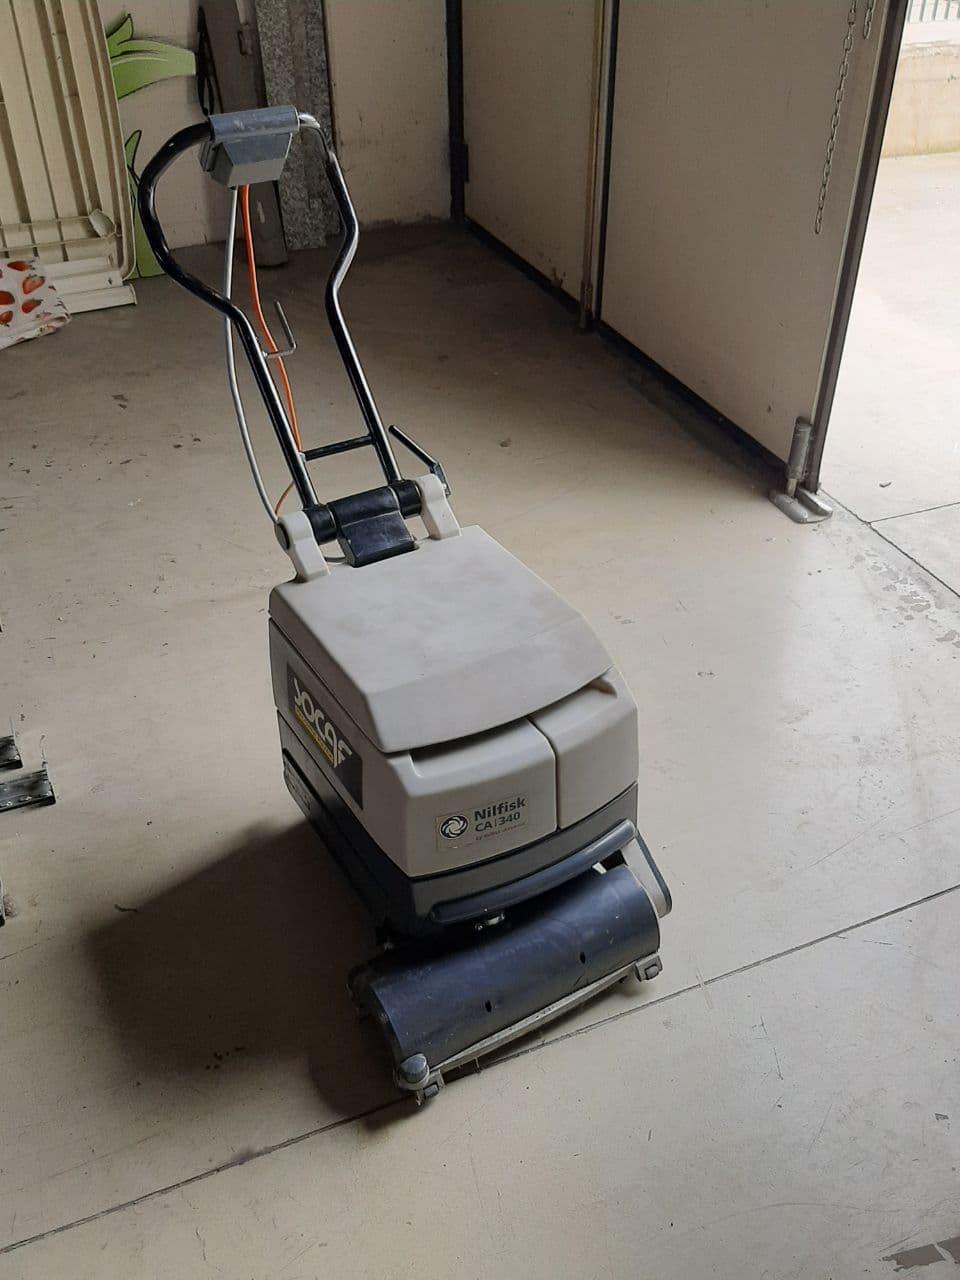 Macchina lava asciuga pavimenti in vendita - foto 2